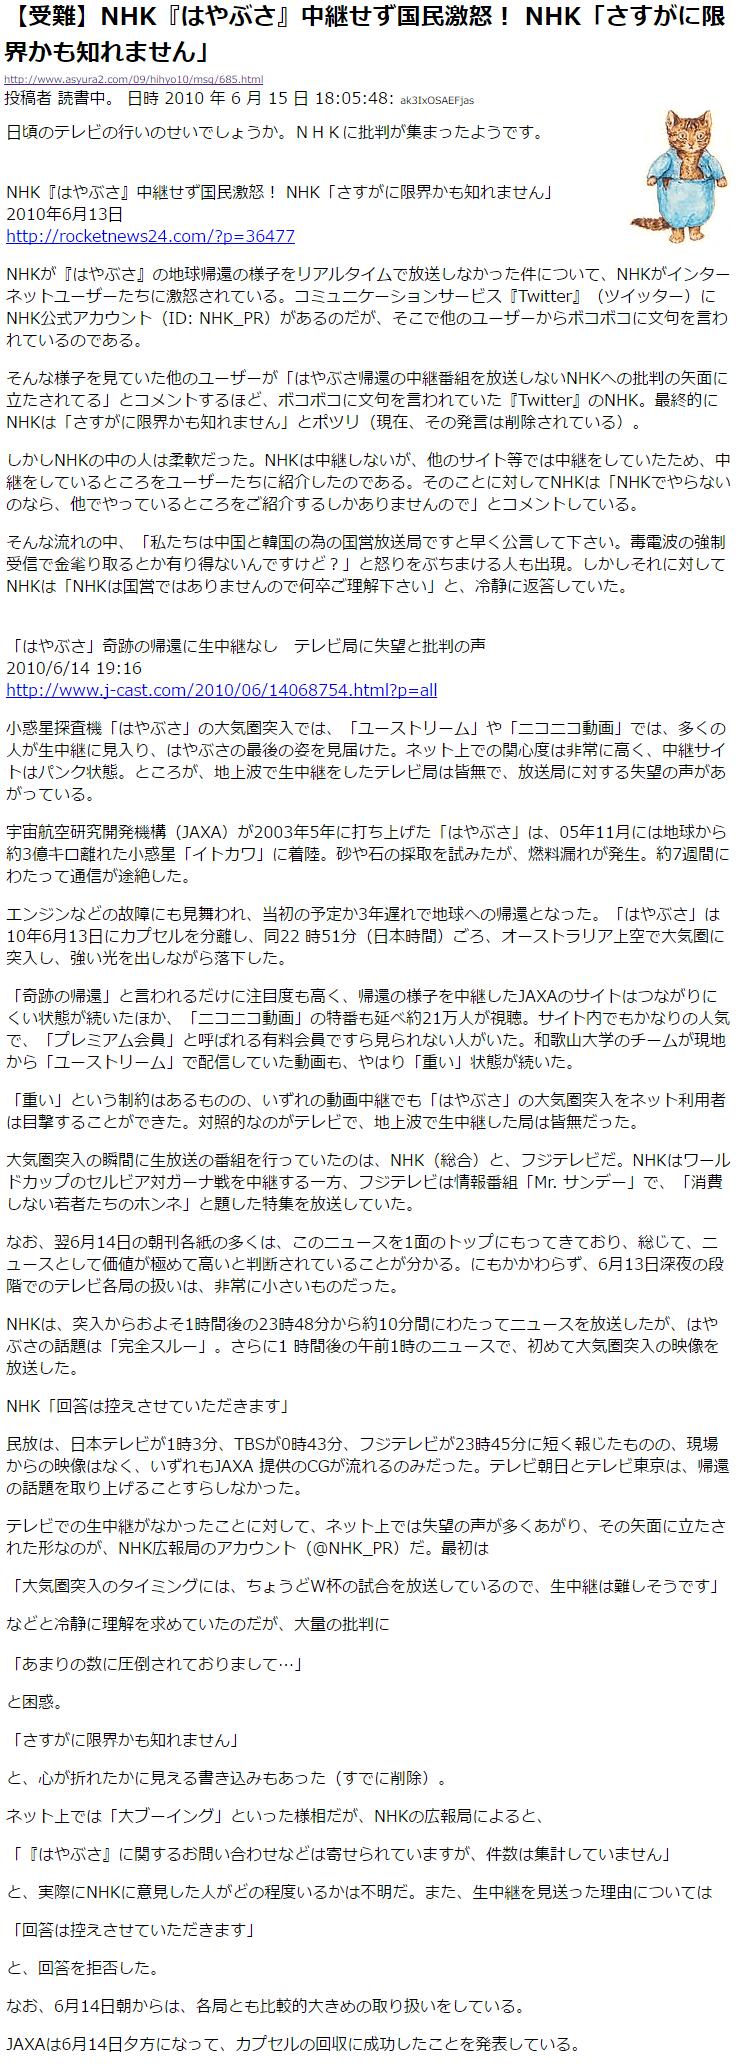 NHK『はやぶさ』中継せず国民激怒!